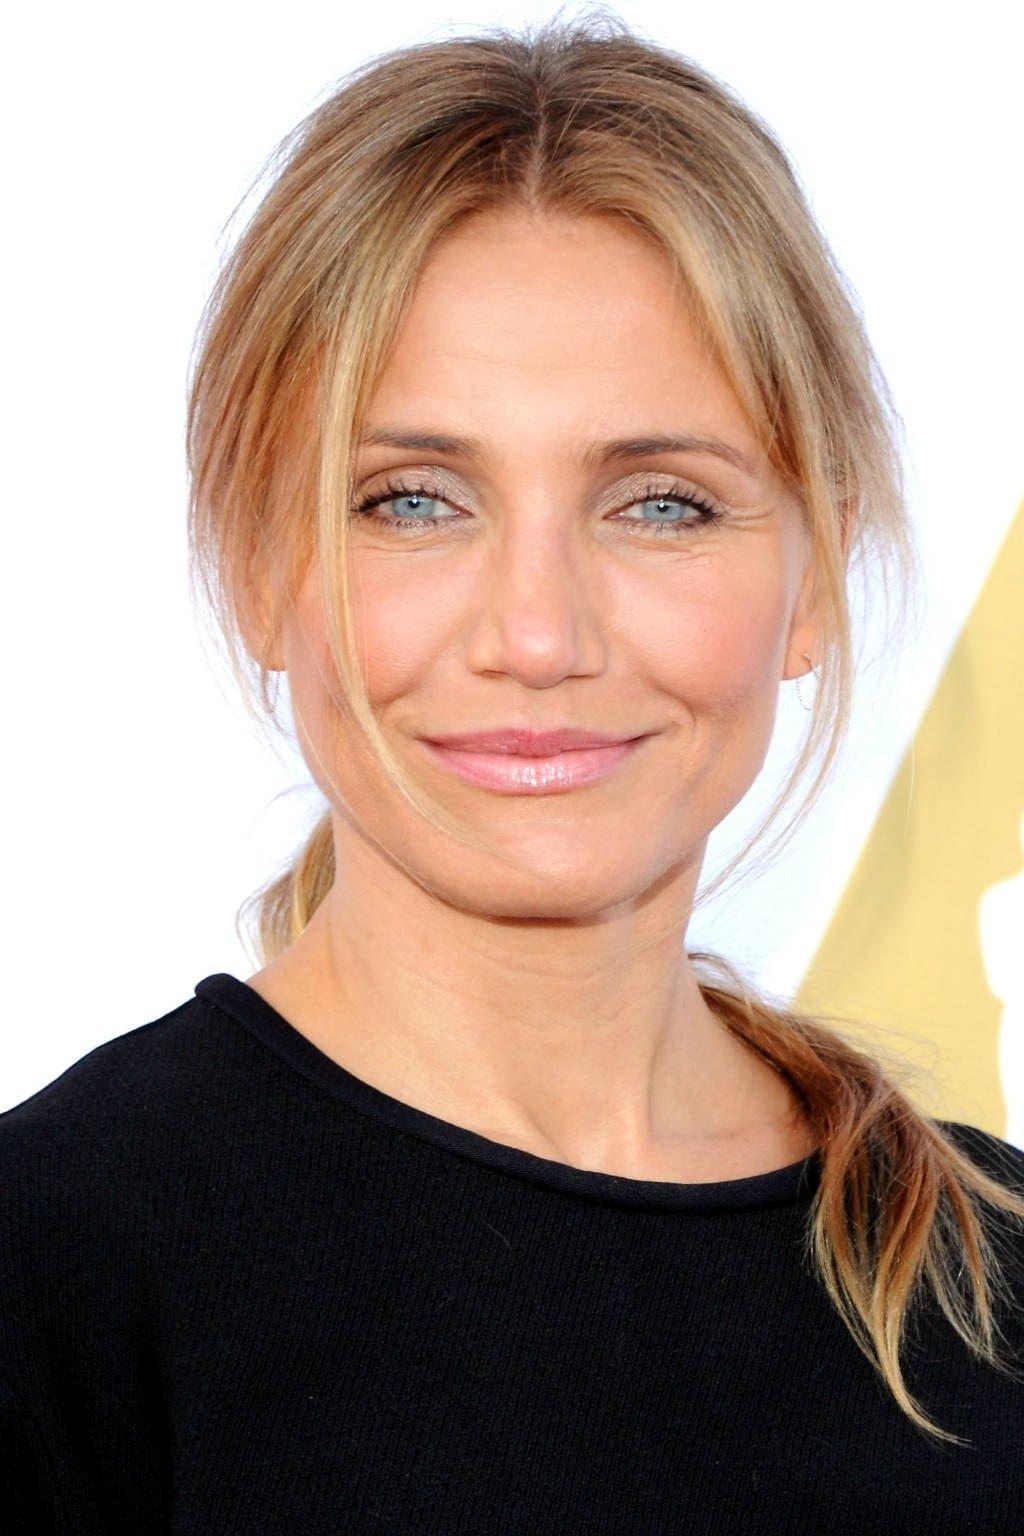 20 actores que inexplicablemente nunca han ganado un Oscar Cameron Diaz